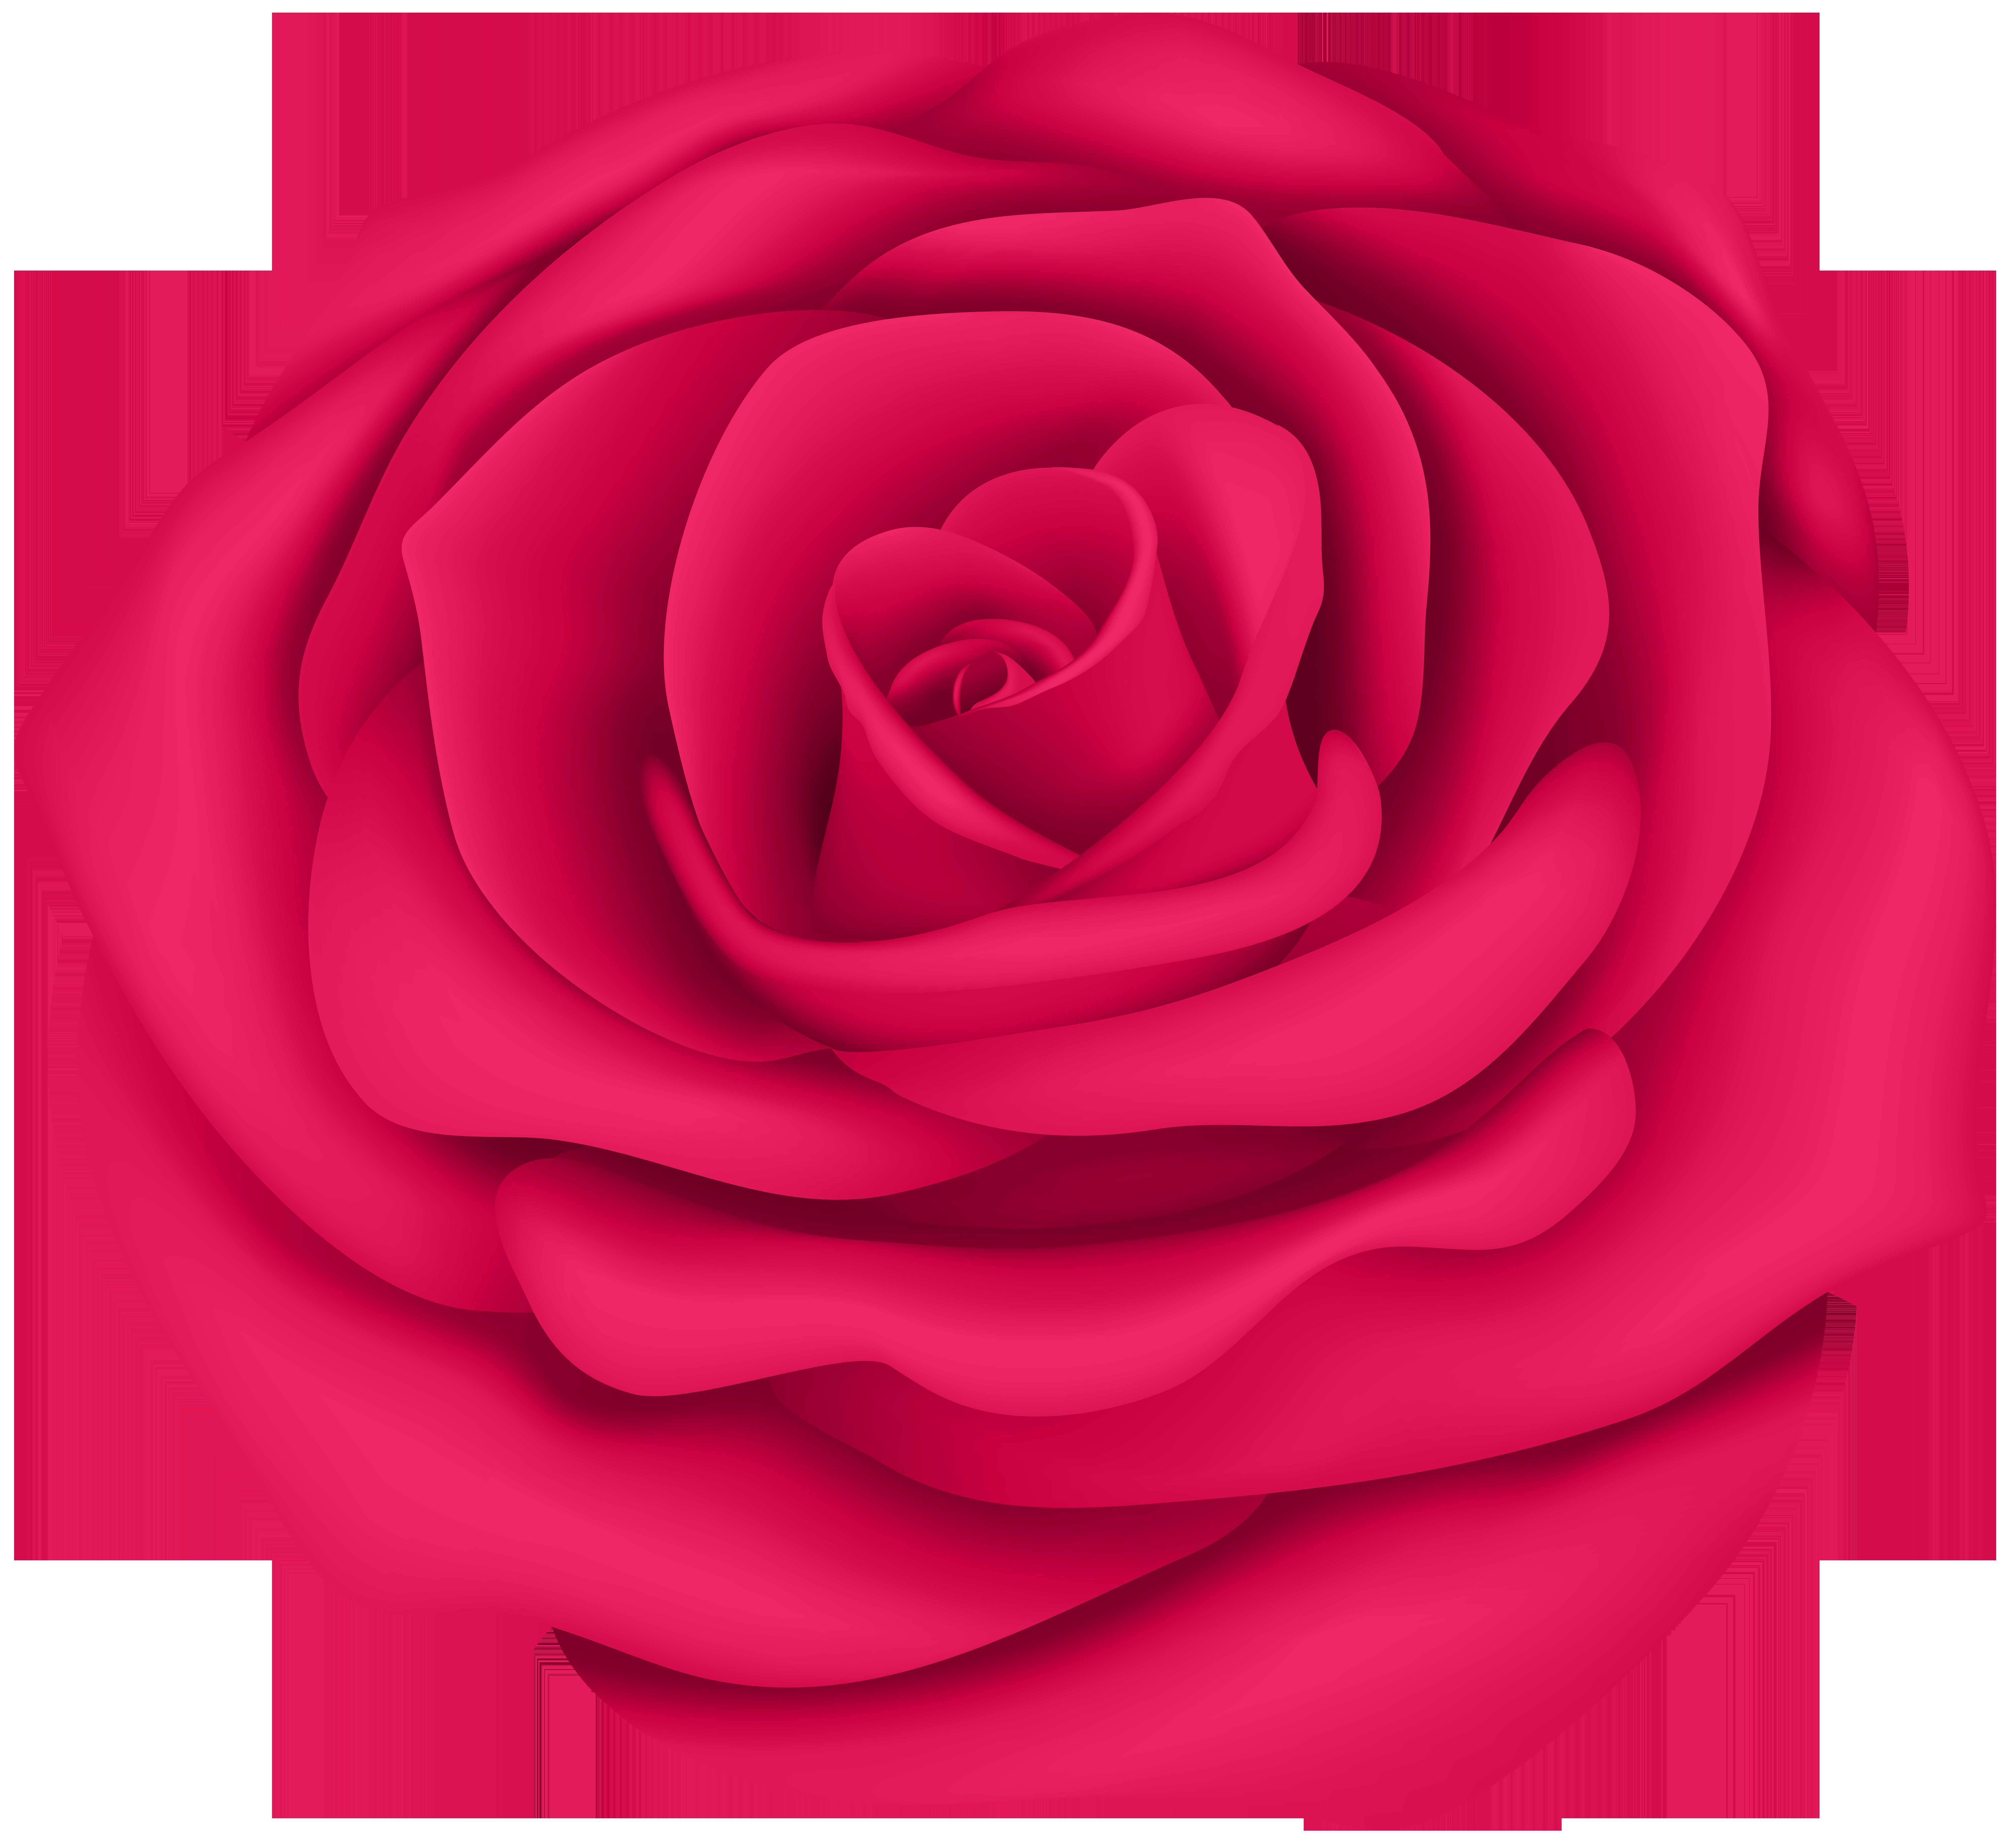 Rose flower images clipart jpg free download Pink Rose Flower Transparent Clip Art Image   Gallery Yopriceville ... jpg free download